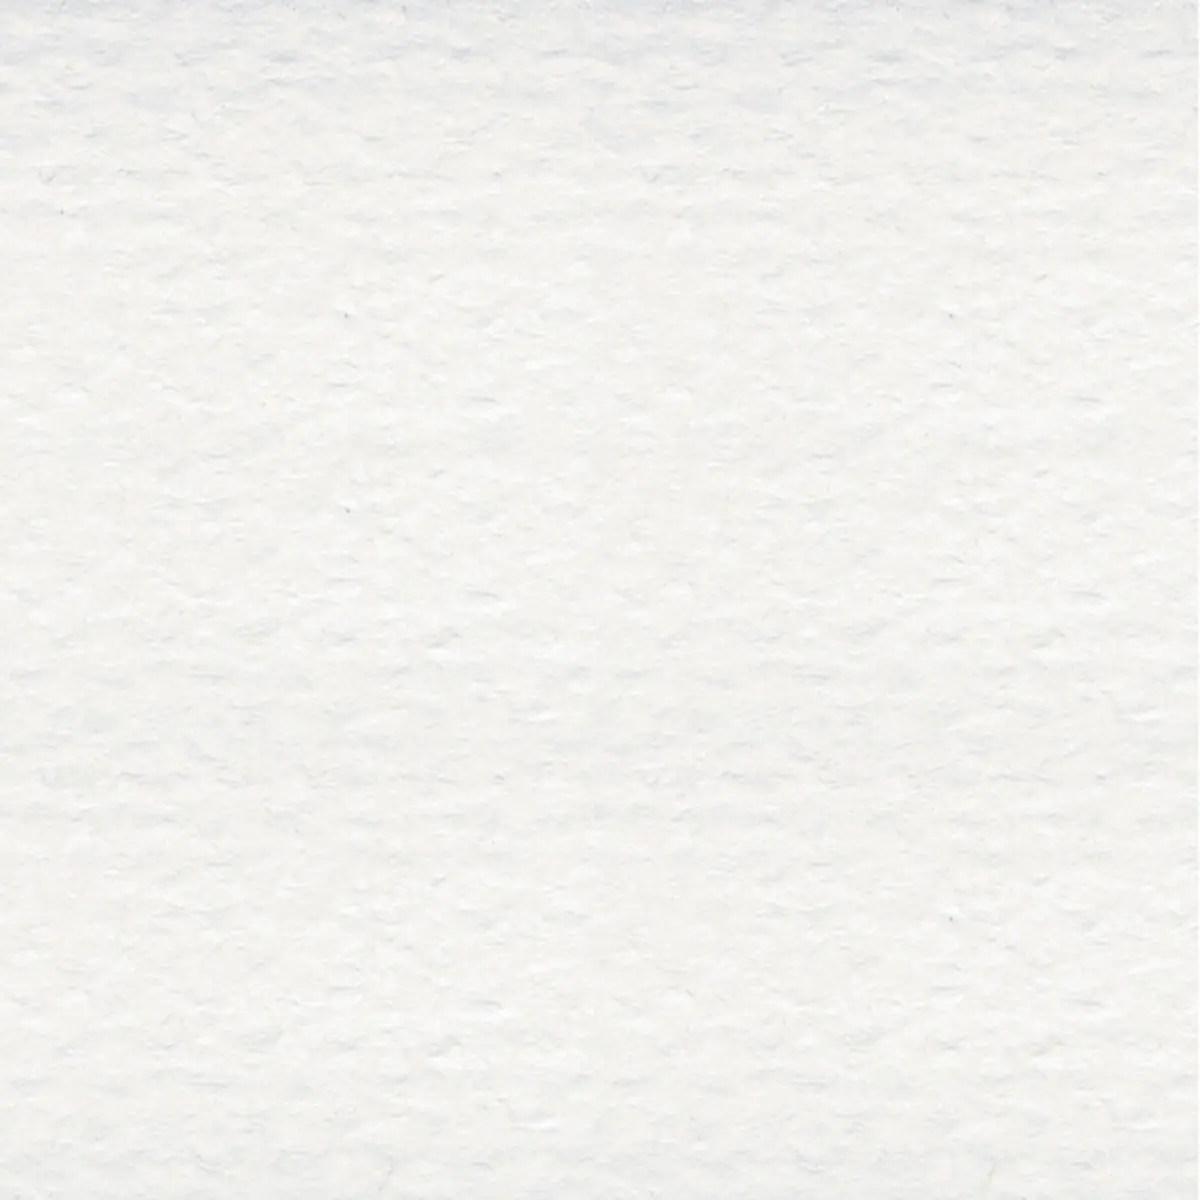 strathmore textured paper sheet